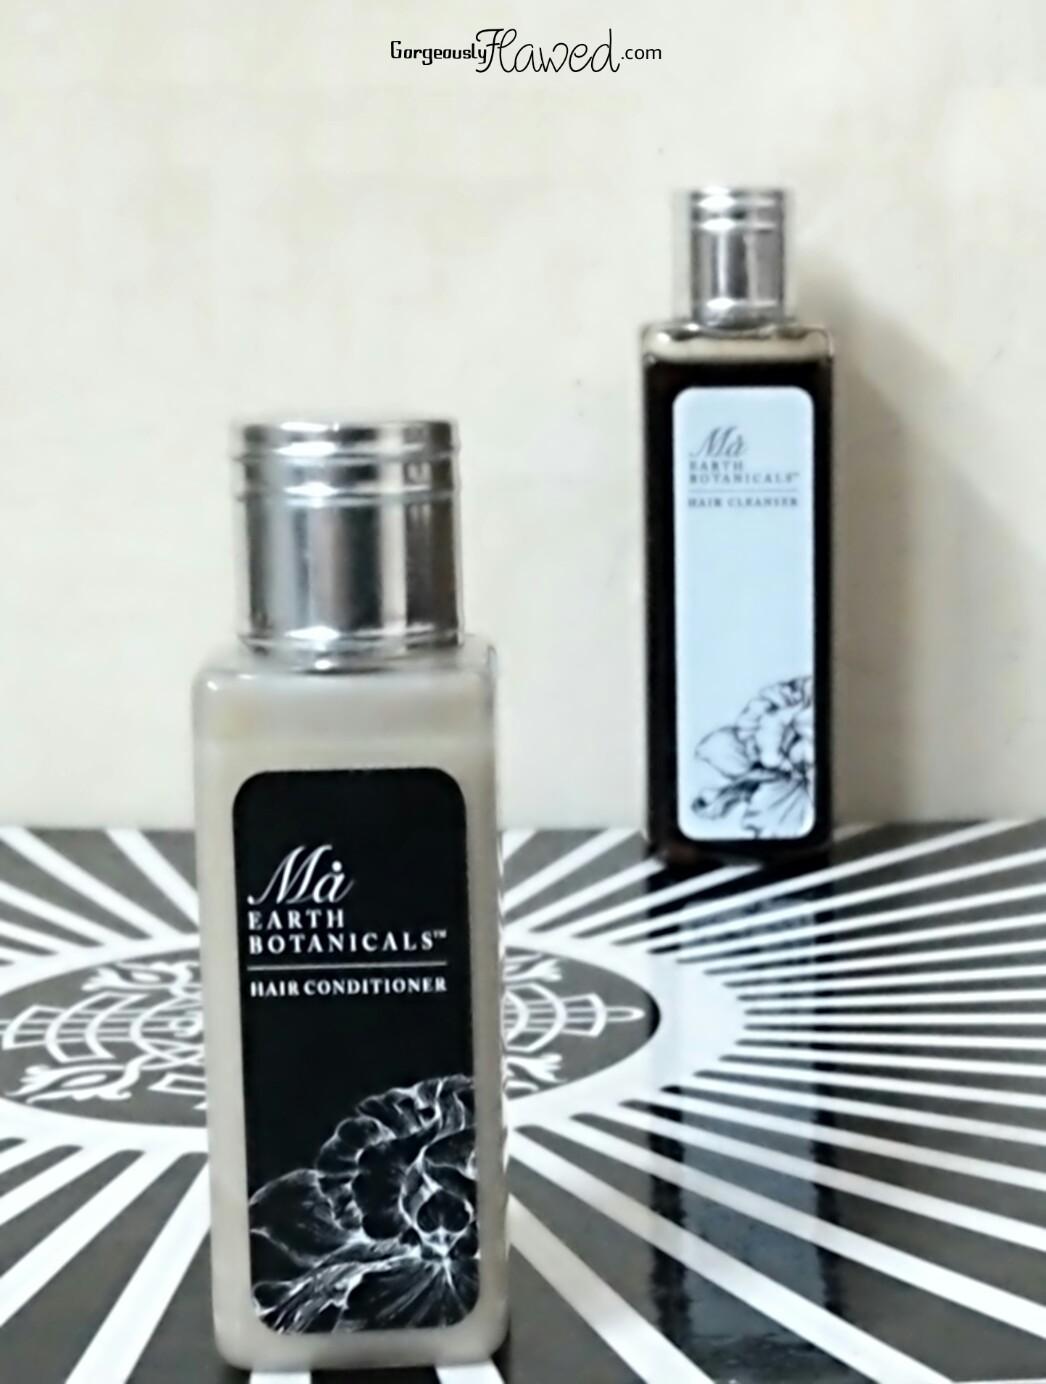 Ma earth botanicals hair cleanser hair conditioner